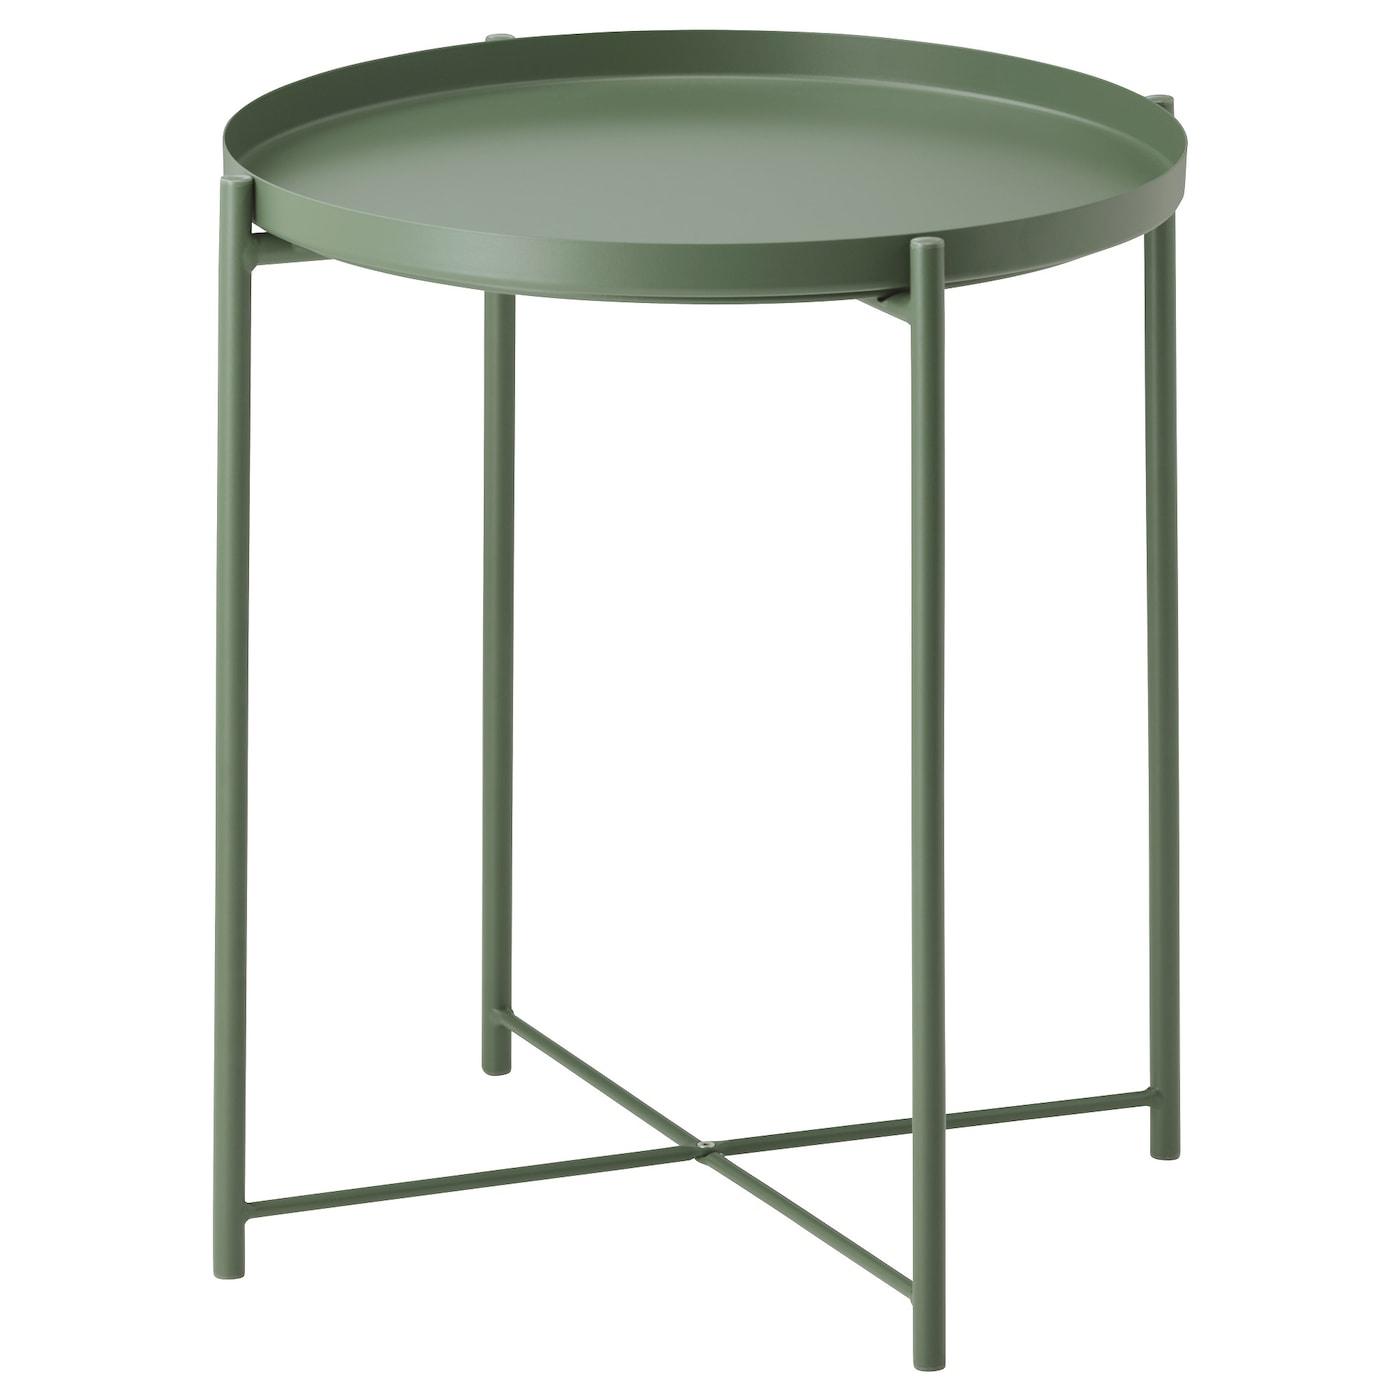 Gladom Table/plateau - Vert Foncé 45X53 Cm à Table Basse De Jardin Ikea